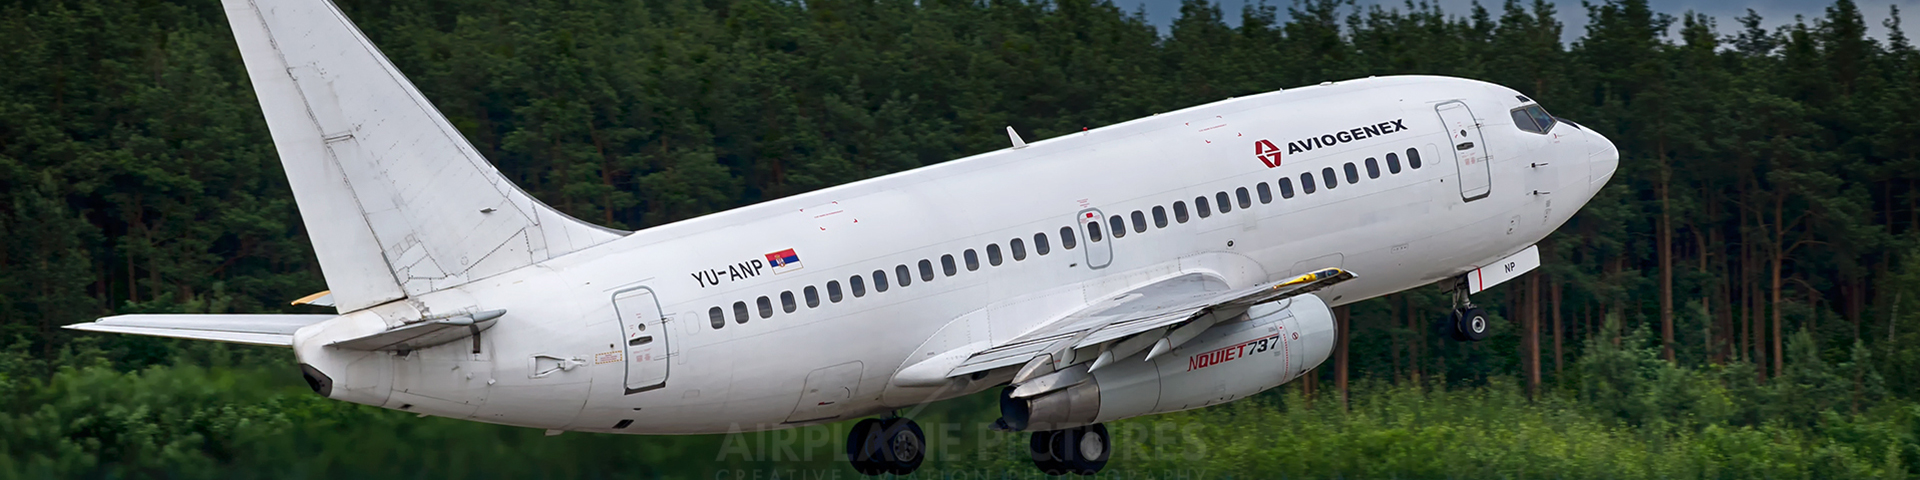 7371 - Boeing 737-300 VIP/500 VIP Private Jet